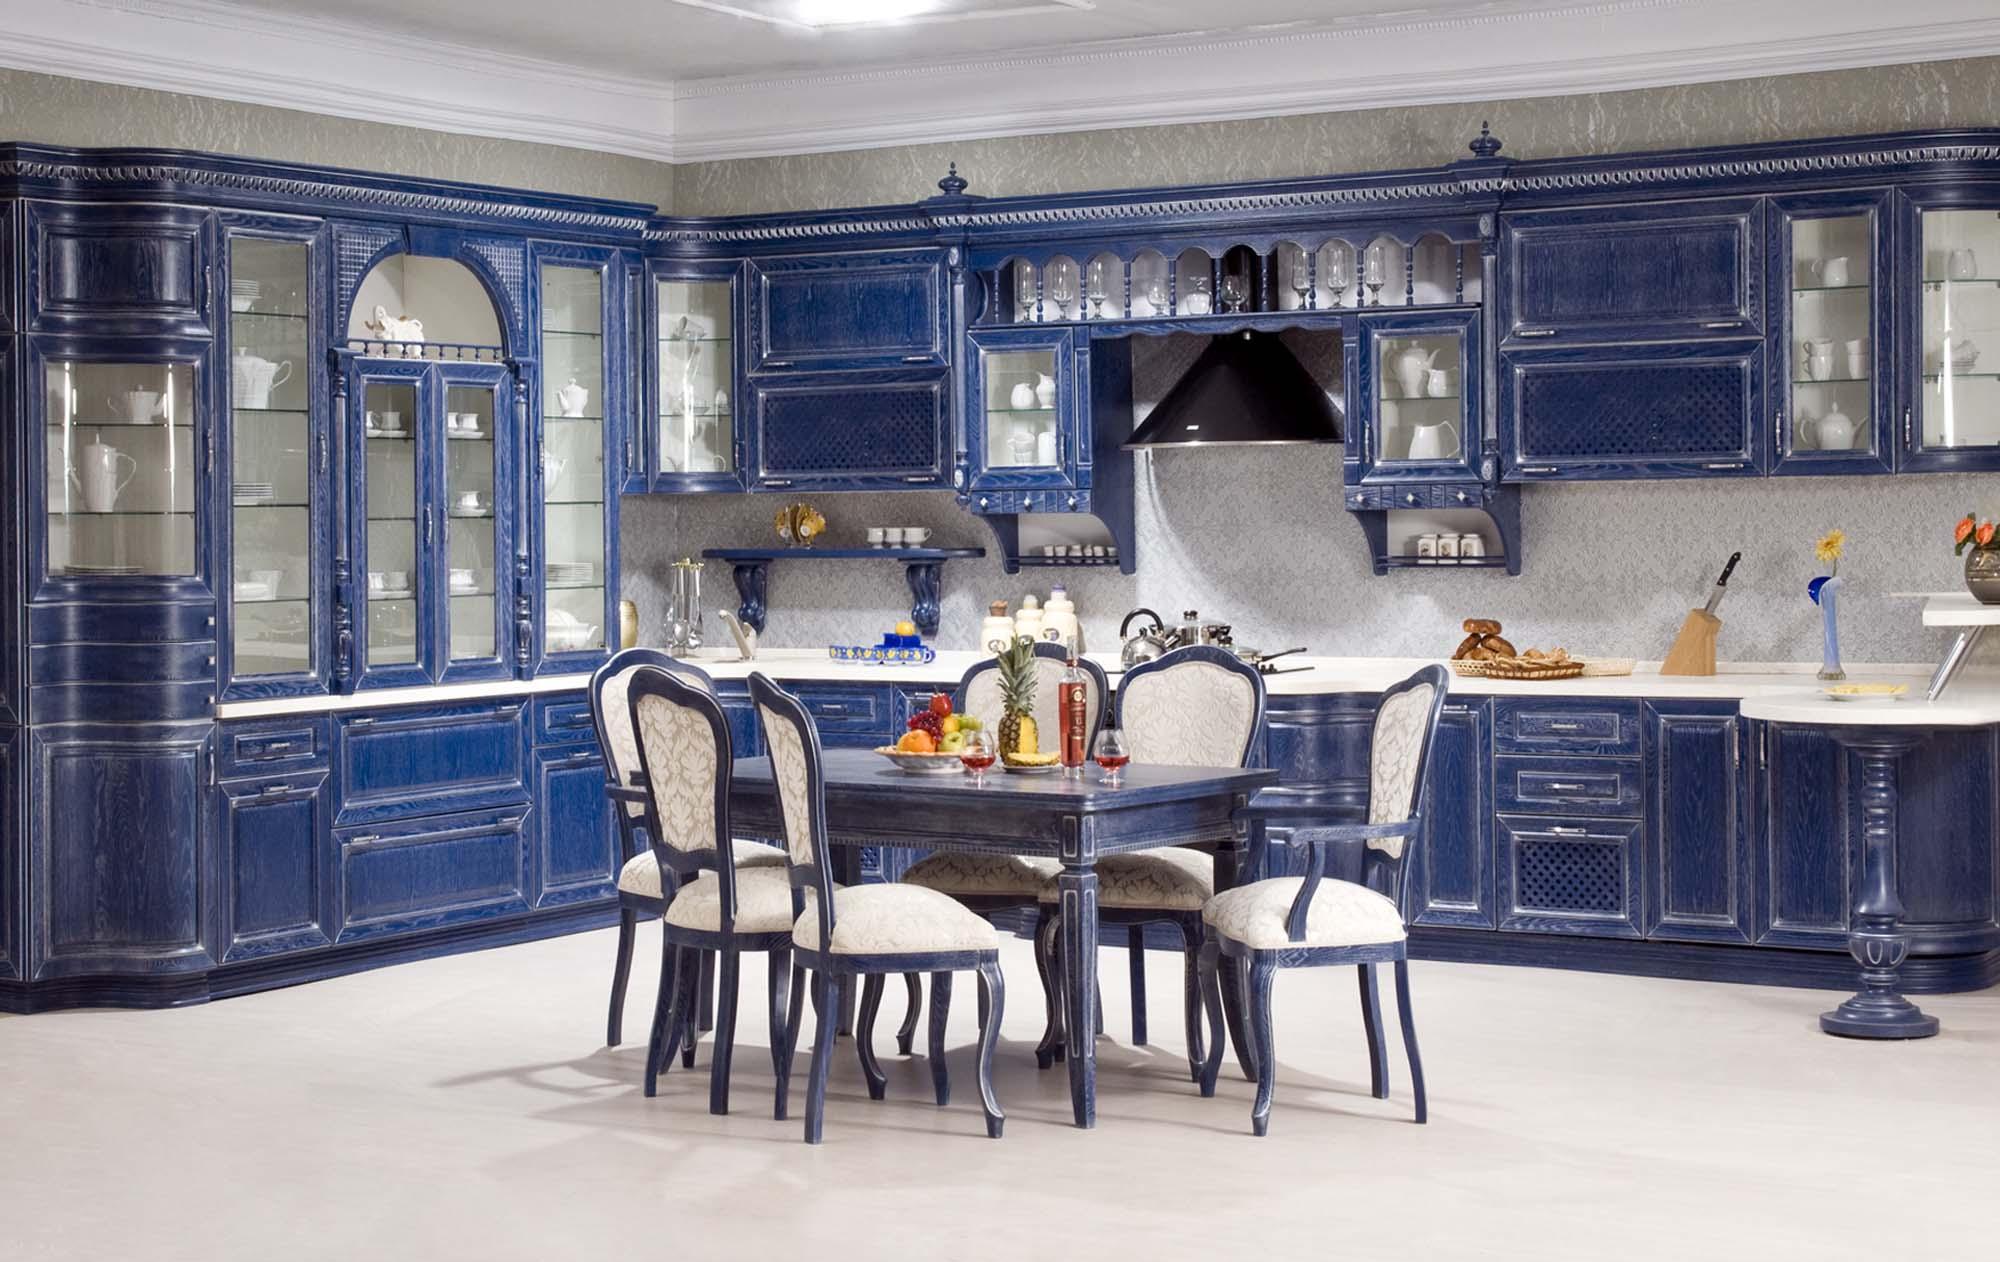 Белый пол и синий гарнитур на кухне